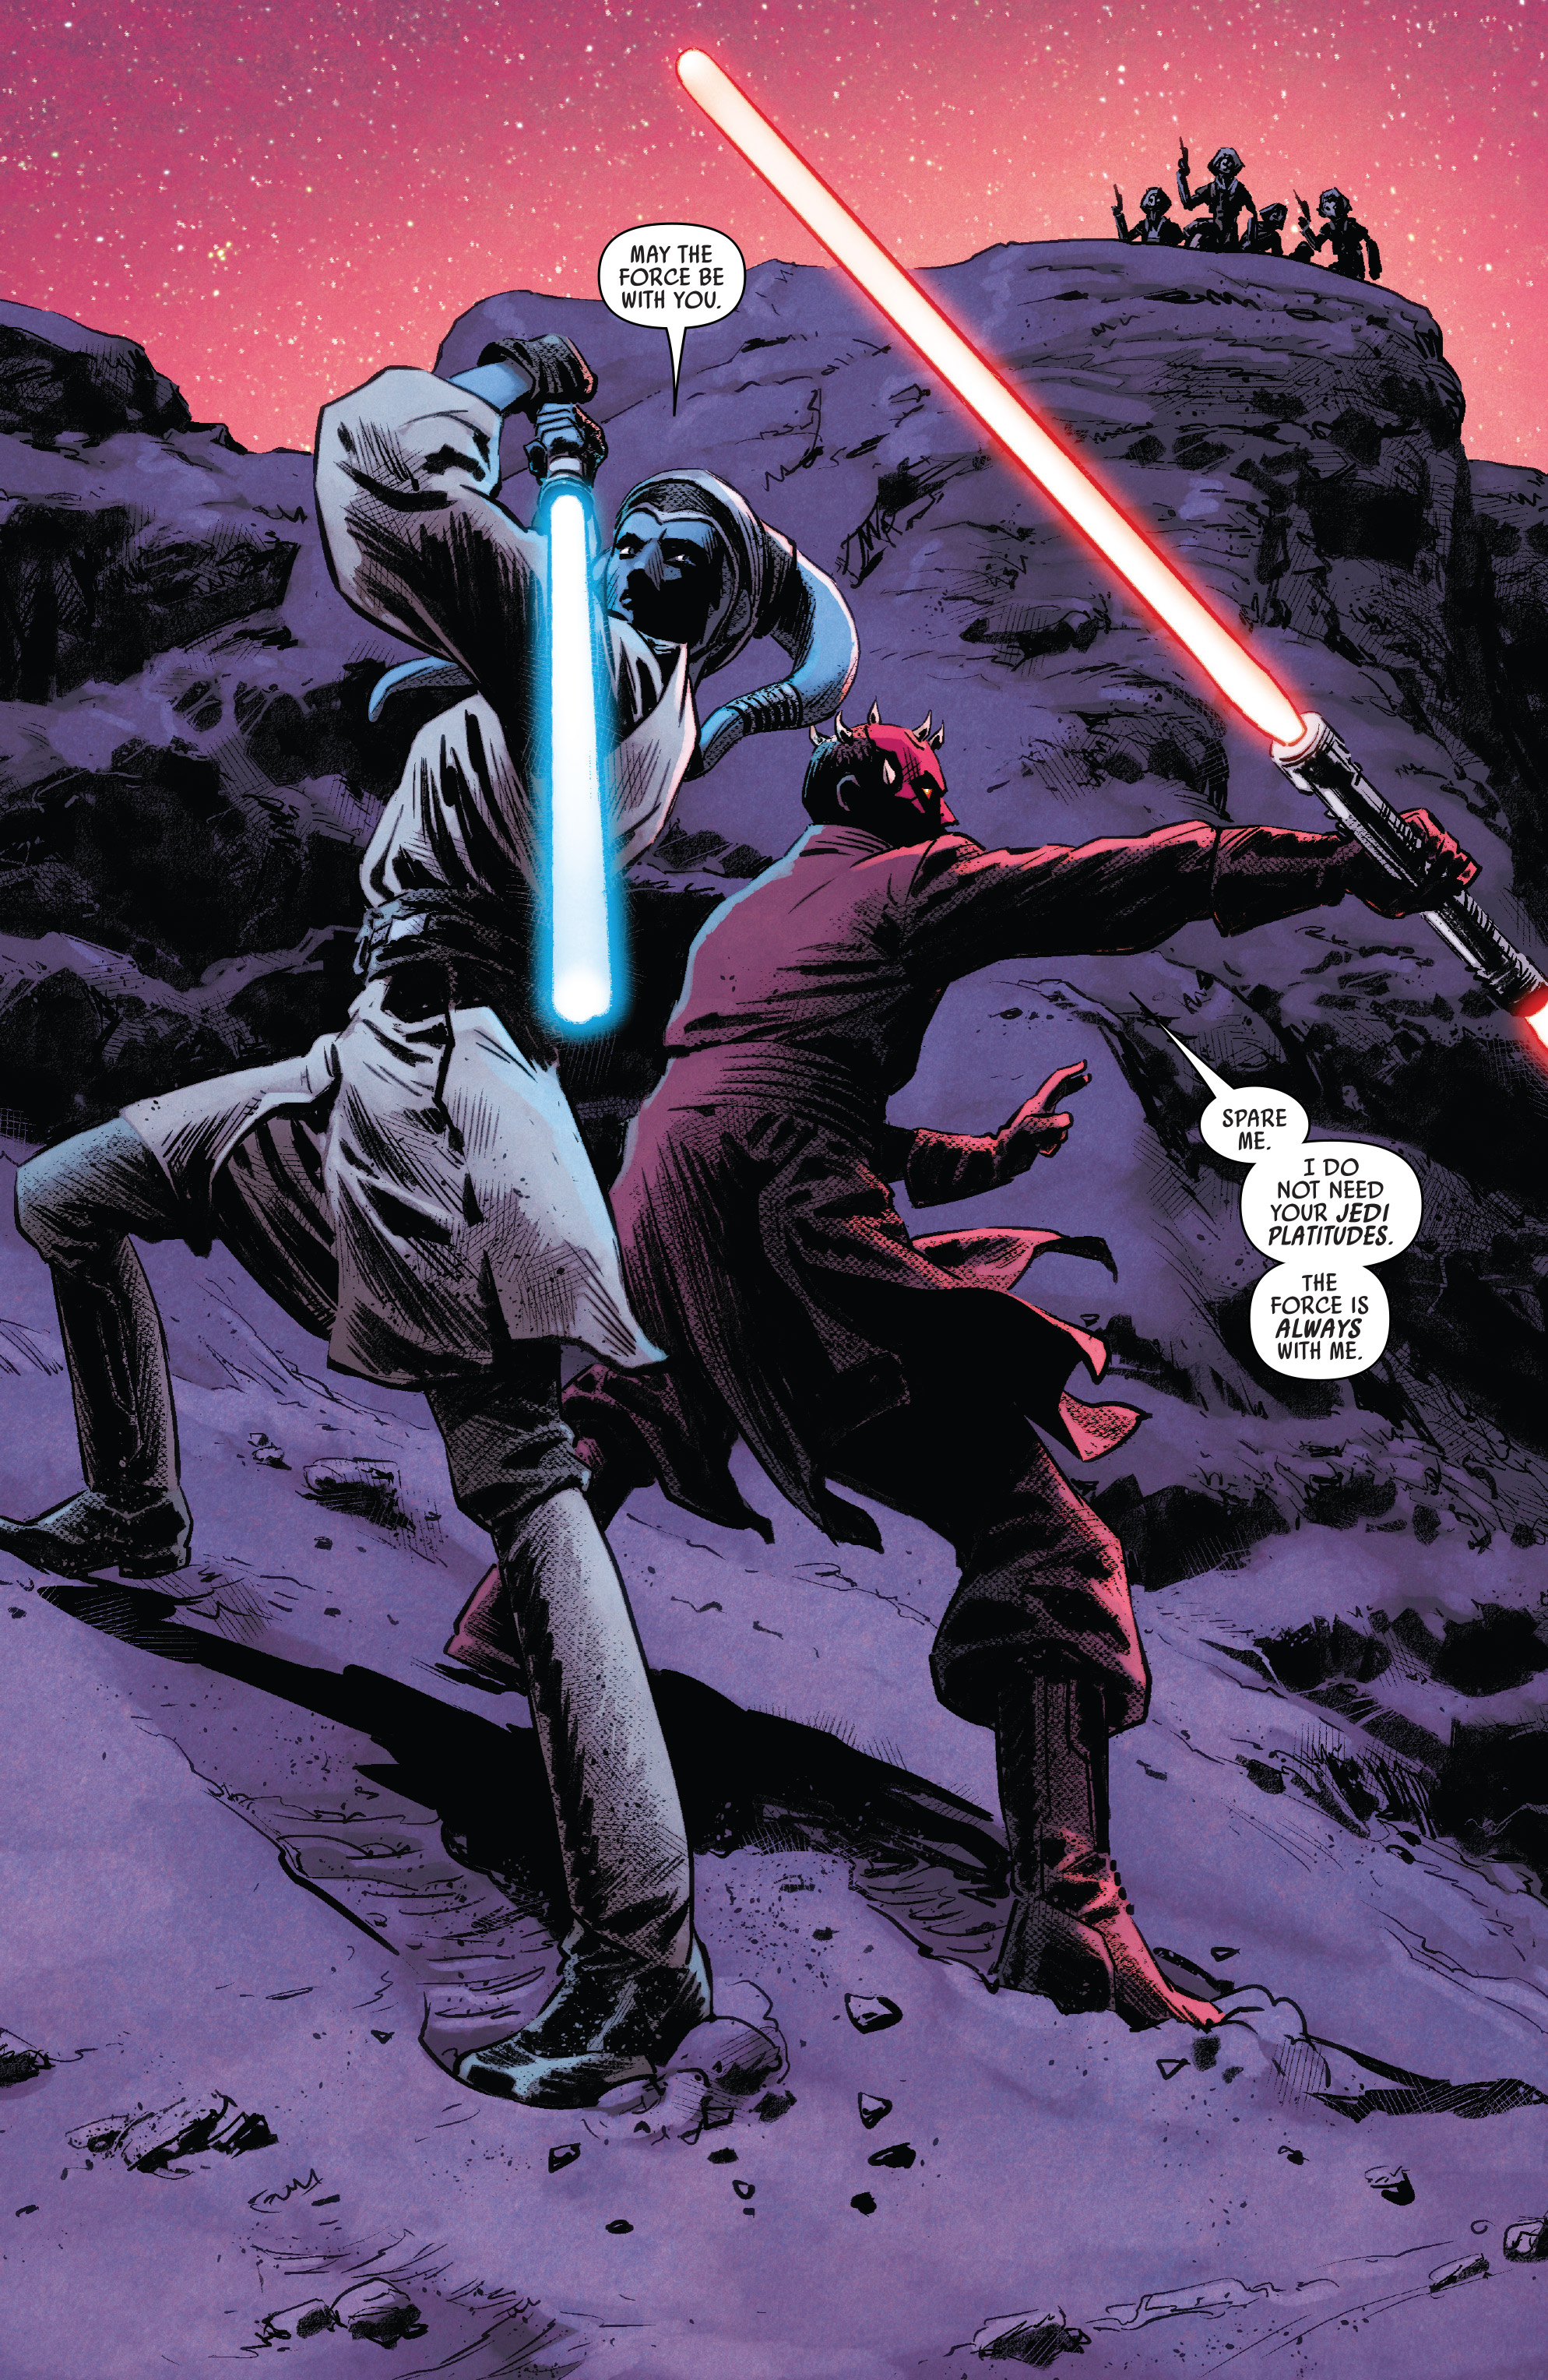 Read online Darth Maul comic -  Issue #4 - 11